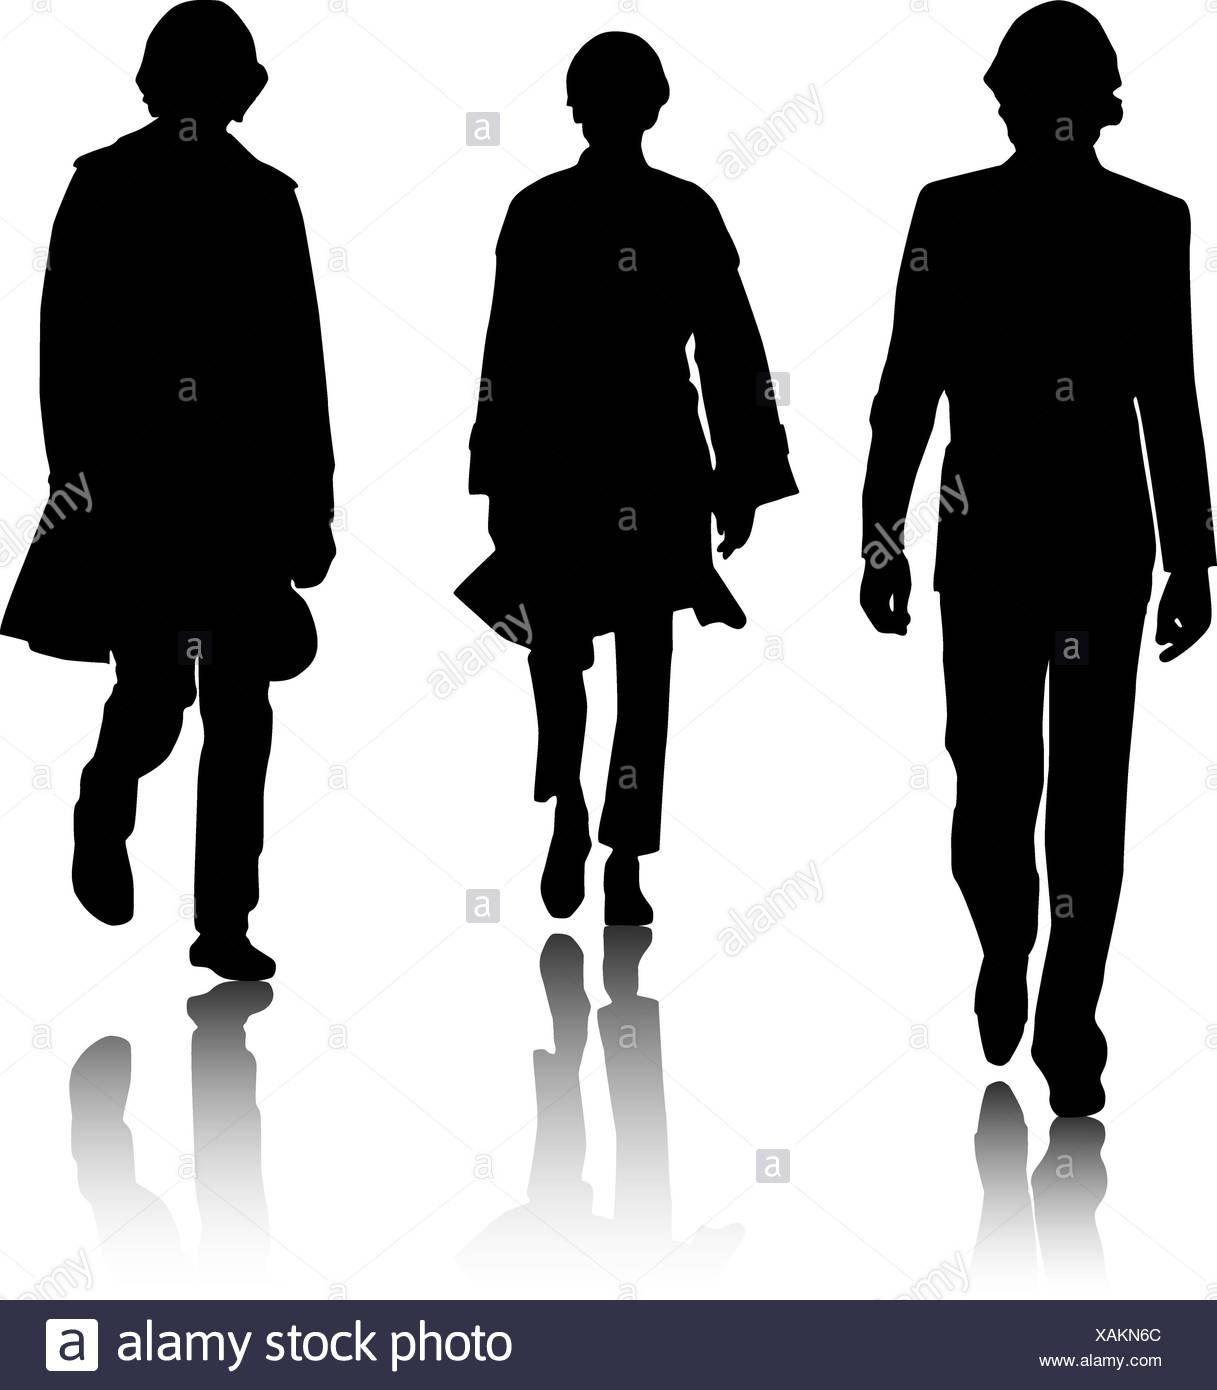 f79b732f455 Silhouette fashion men stock photo alamy jpg 1217x1390 Man silhouette  fashion